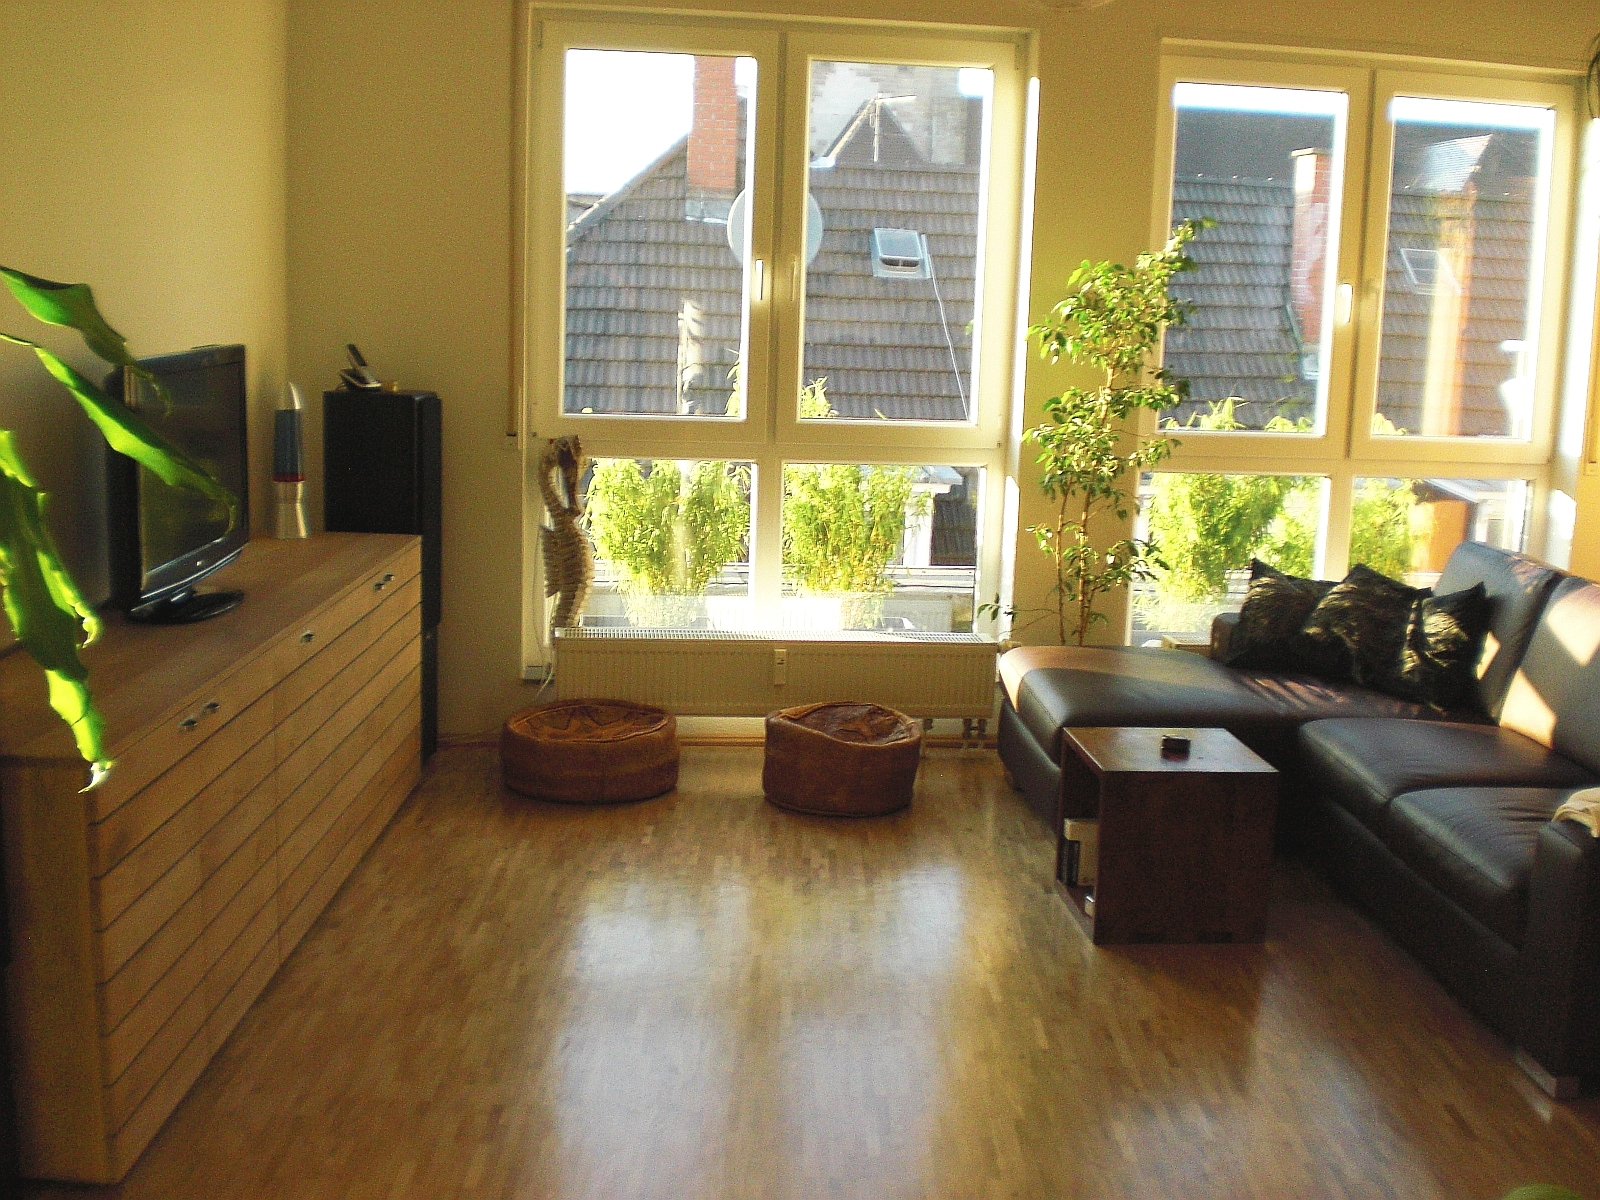 mannheim neckarstadt humboldtstra e welcome inn e k. Black Bedroom Furniture Sets. Home Design Ideas